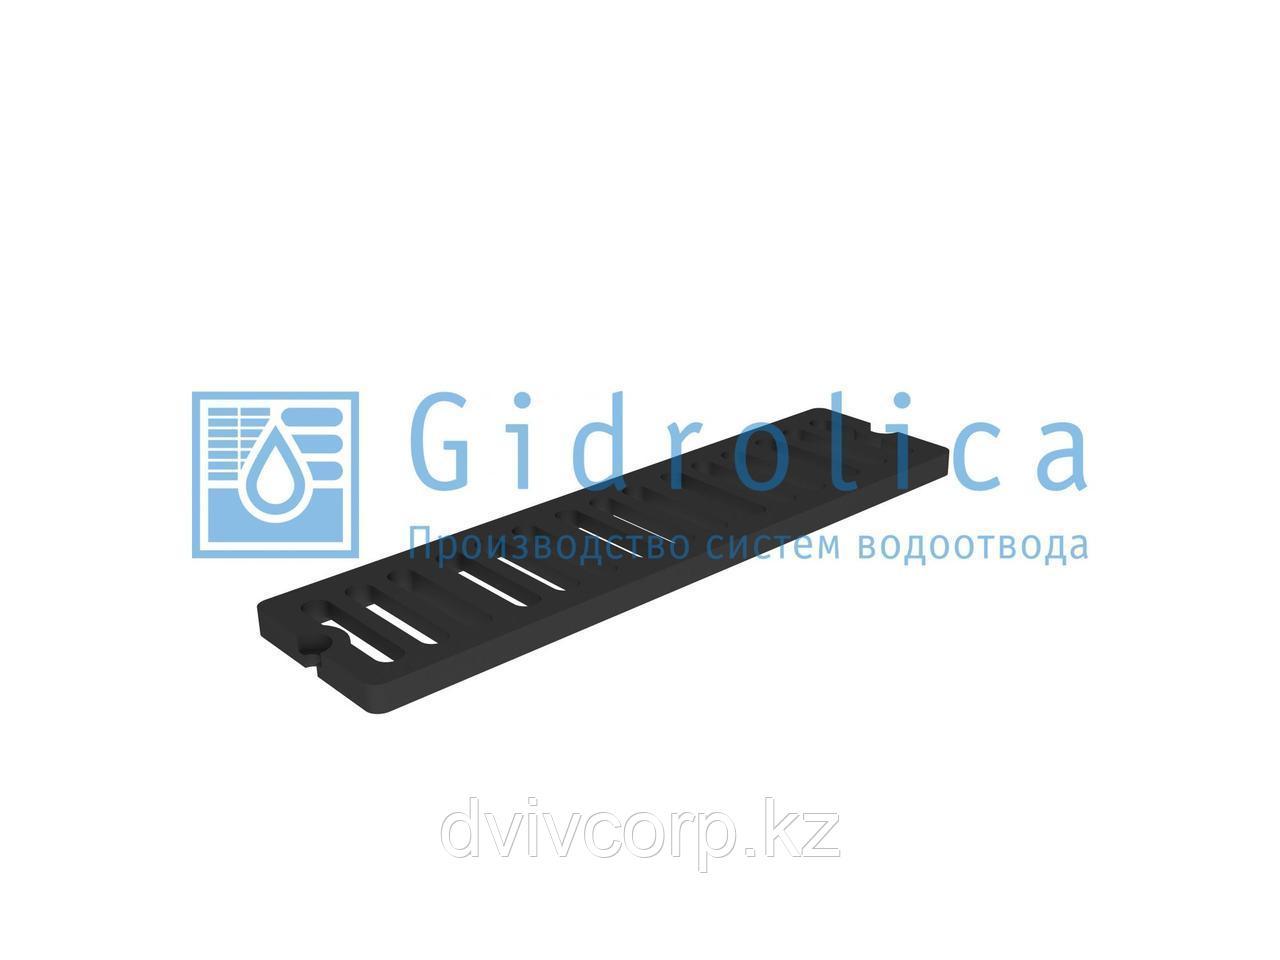 Арт. 5068D Решетка водоприемная СЧ 750*200*27 – чугунная, кл. D400